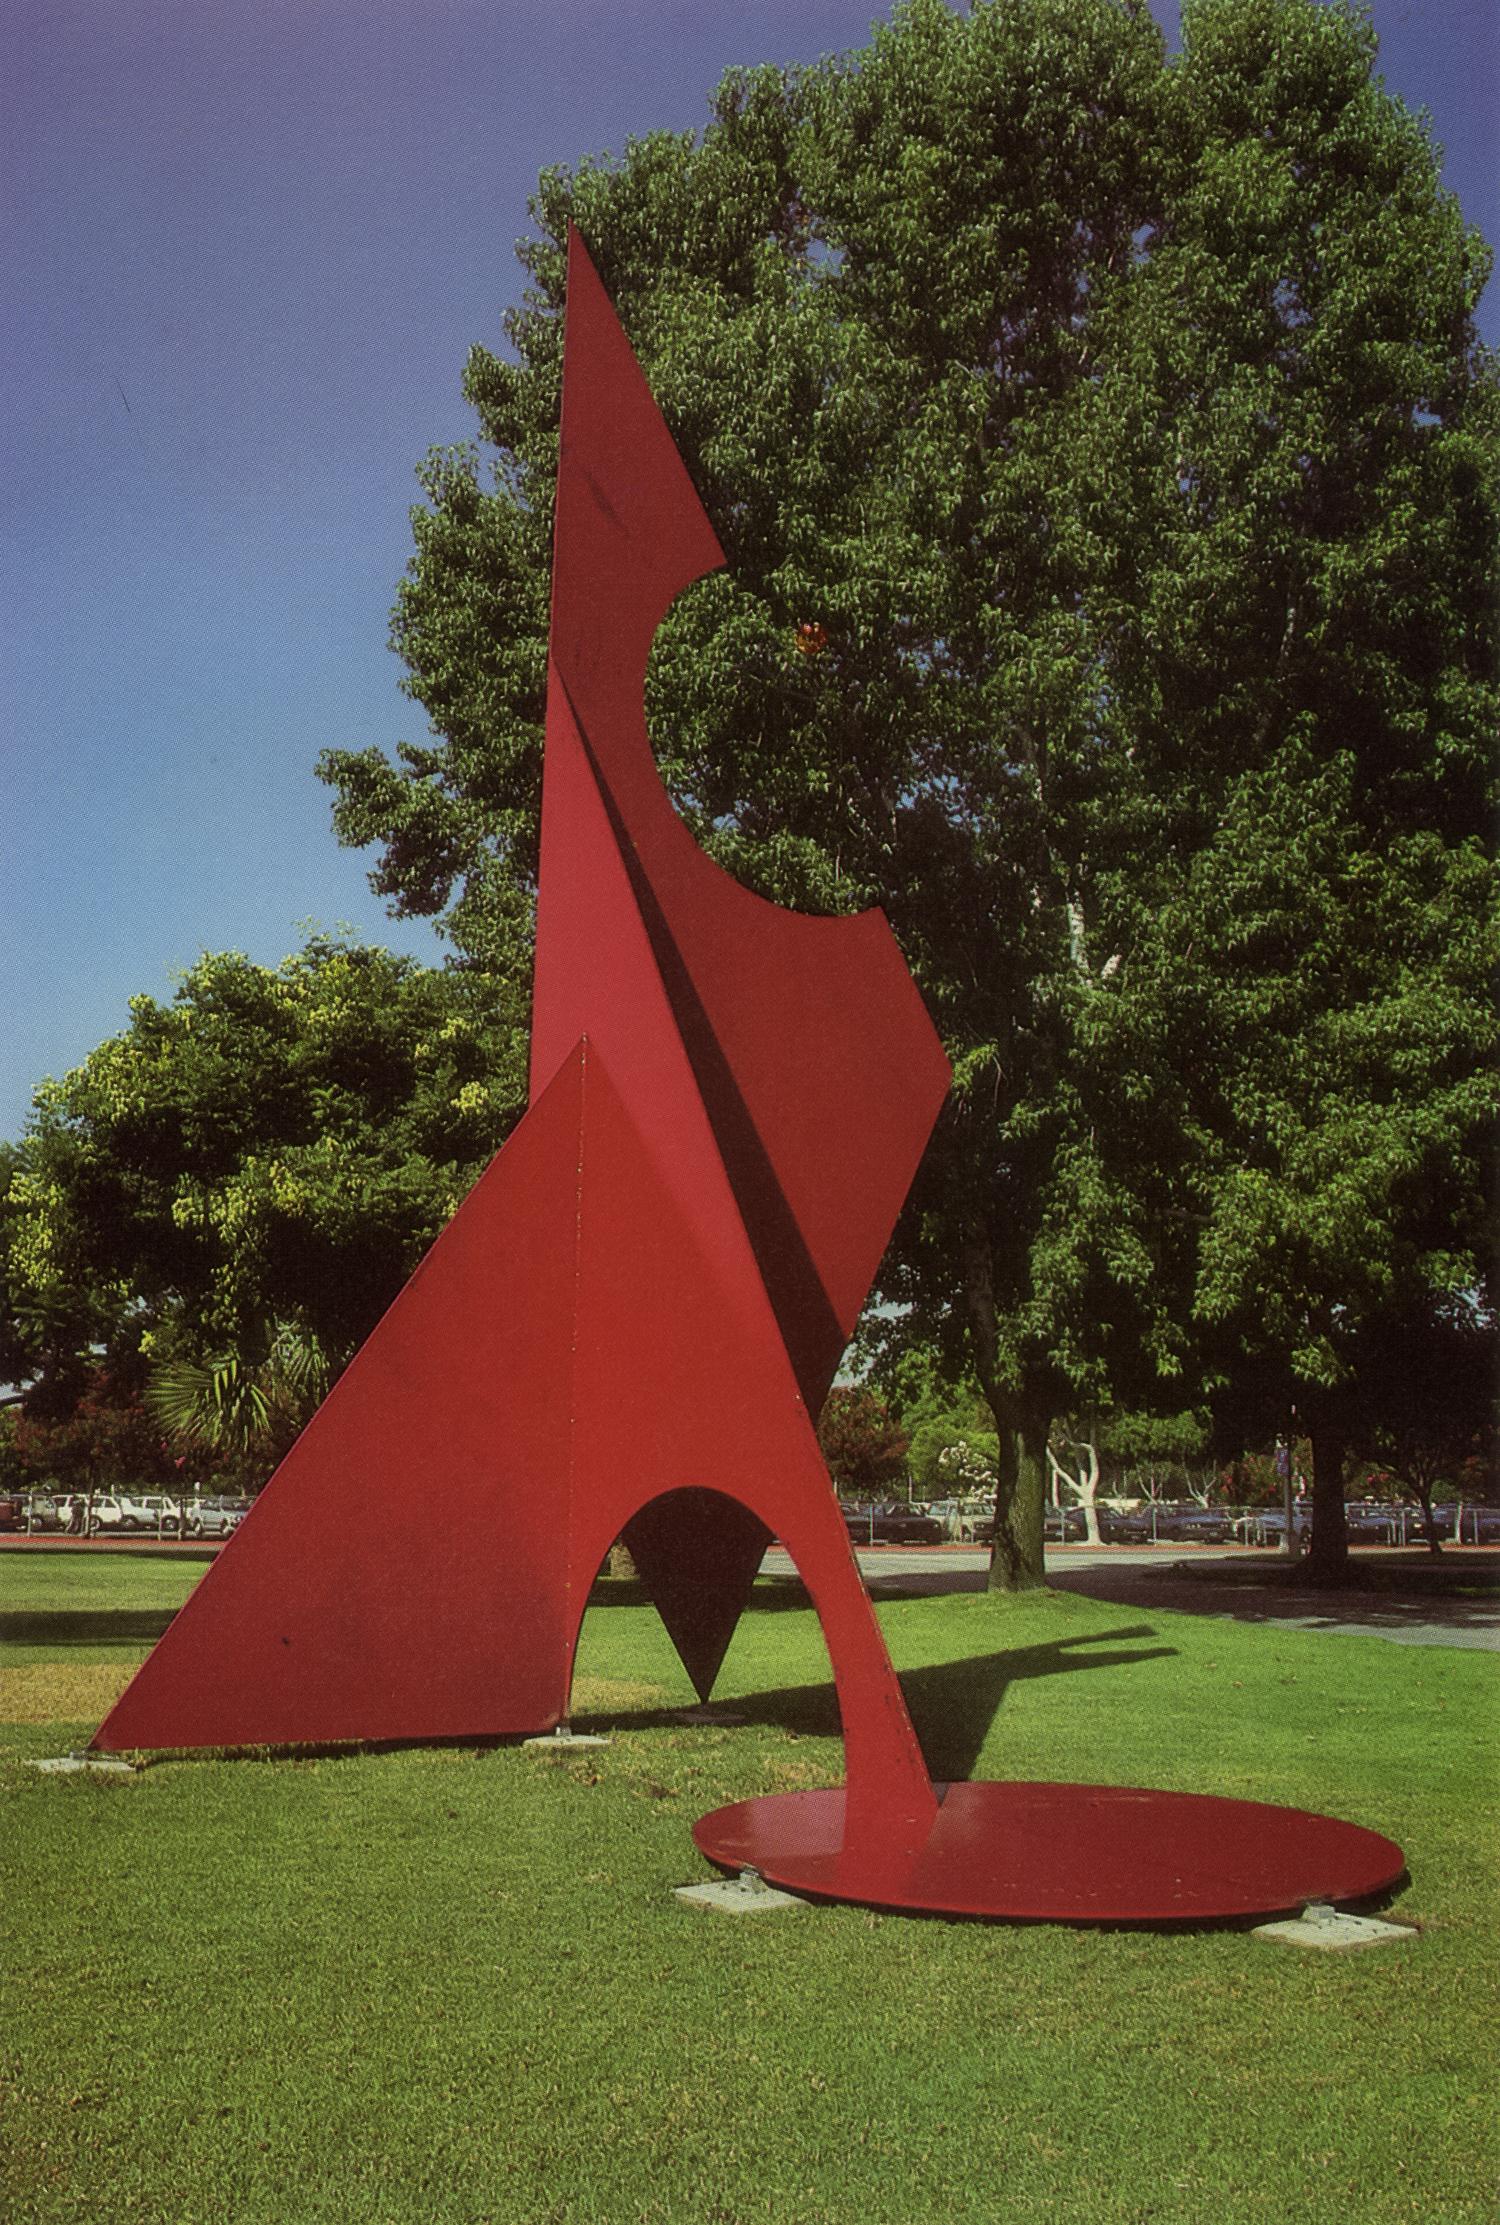 California State University, Fullerton, California; 1985.  Kaikoo XI.  21' x 13.5' x 13.5'.